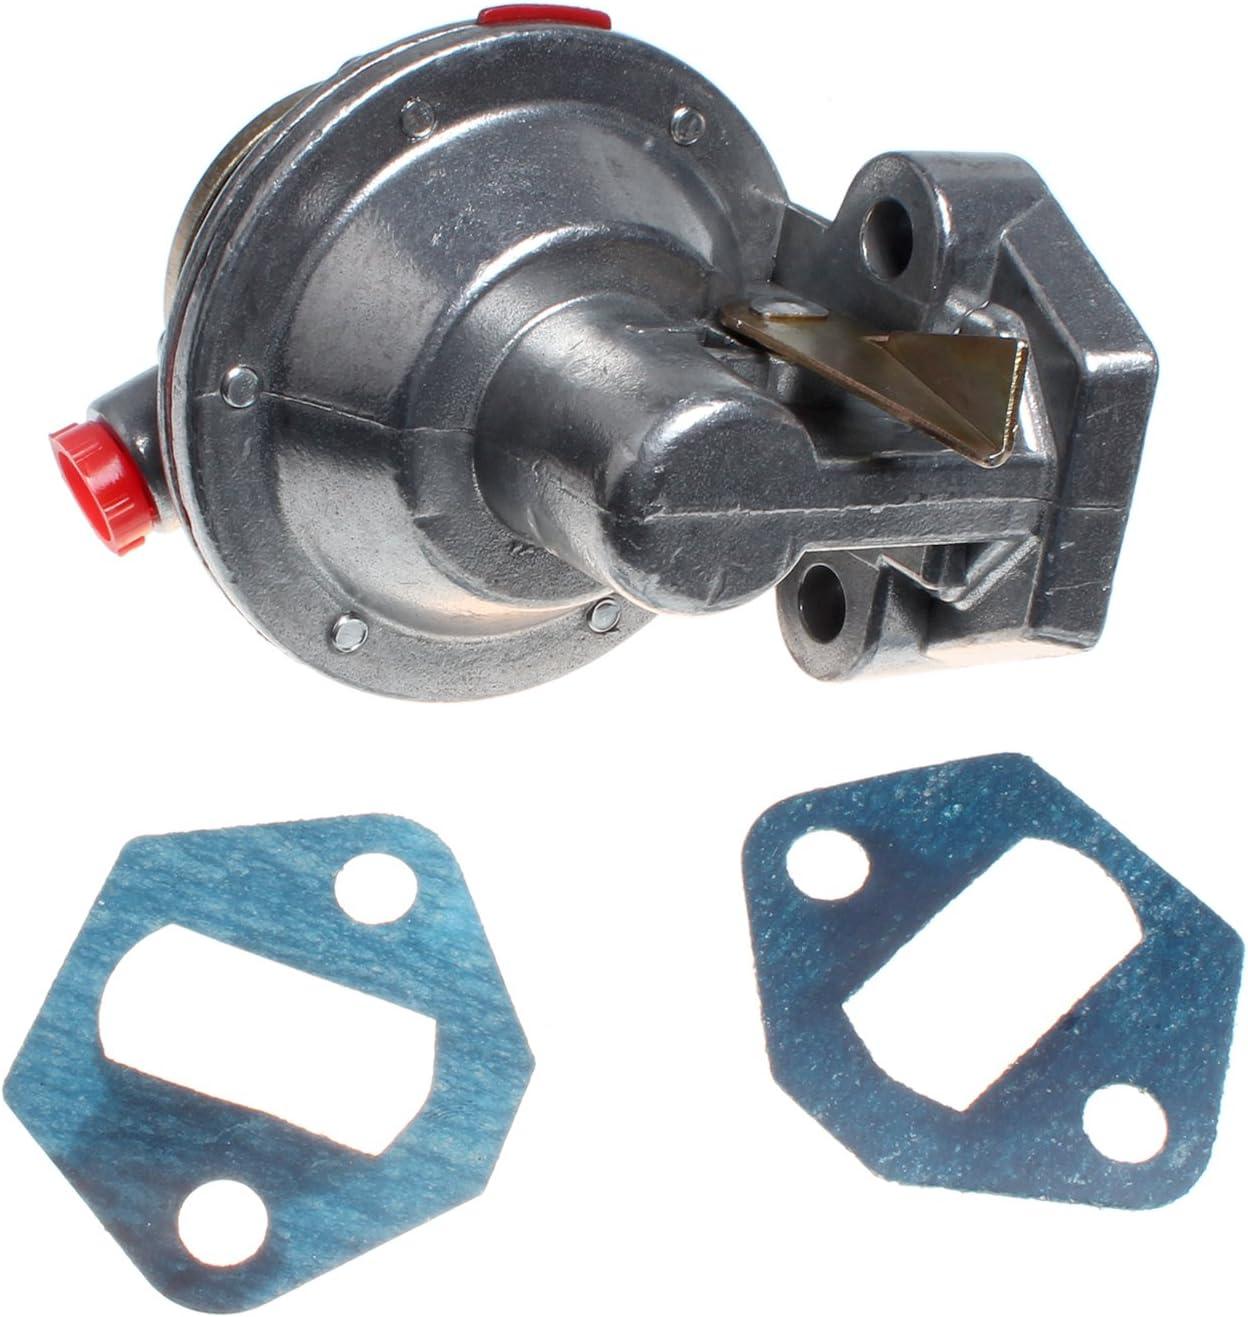 Fuel Pump RE27667 for John Deere 300B 401C 510C 2020 2520